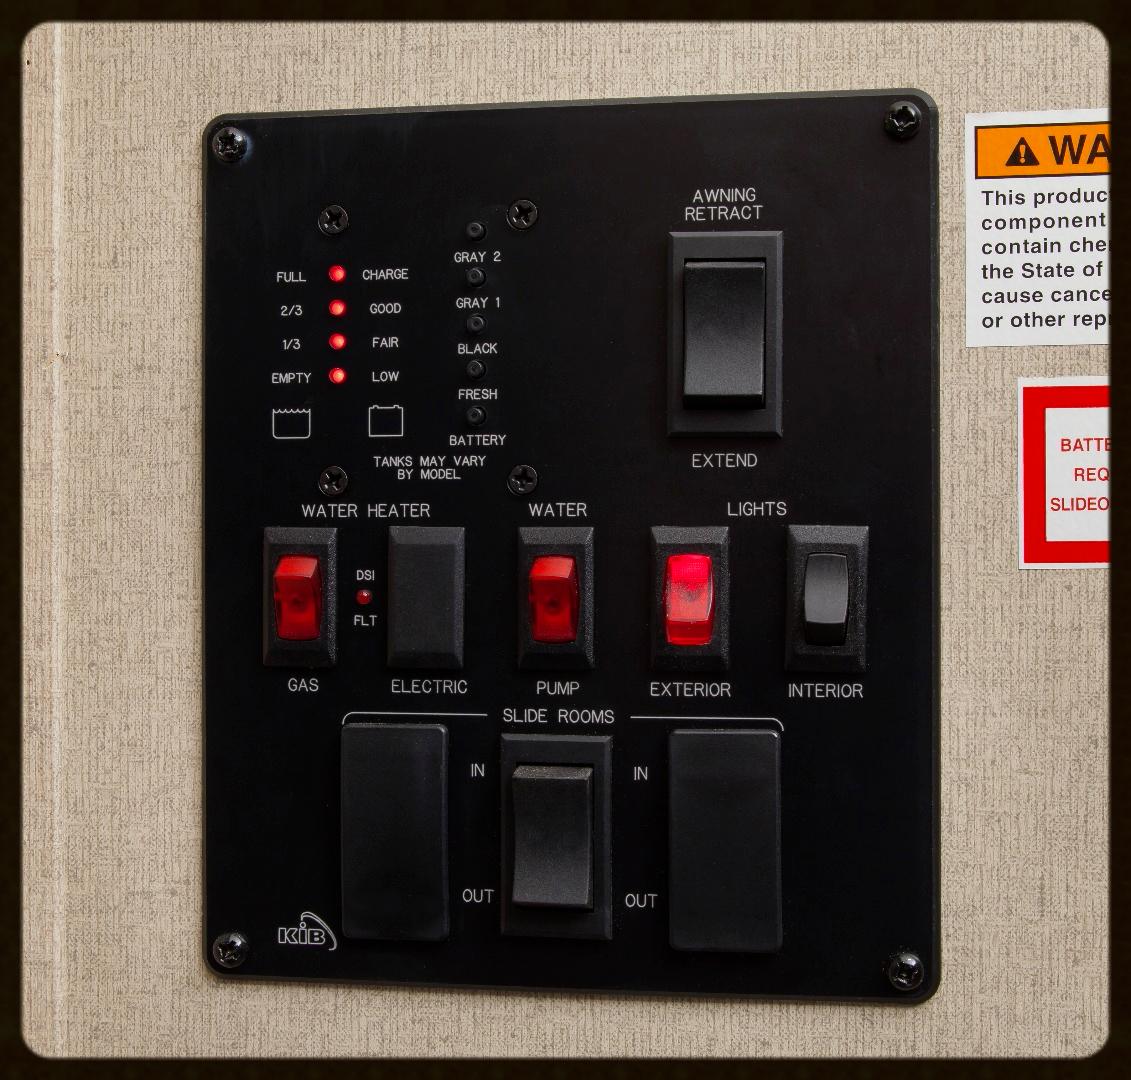 285BH control panel